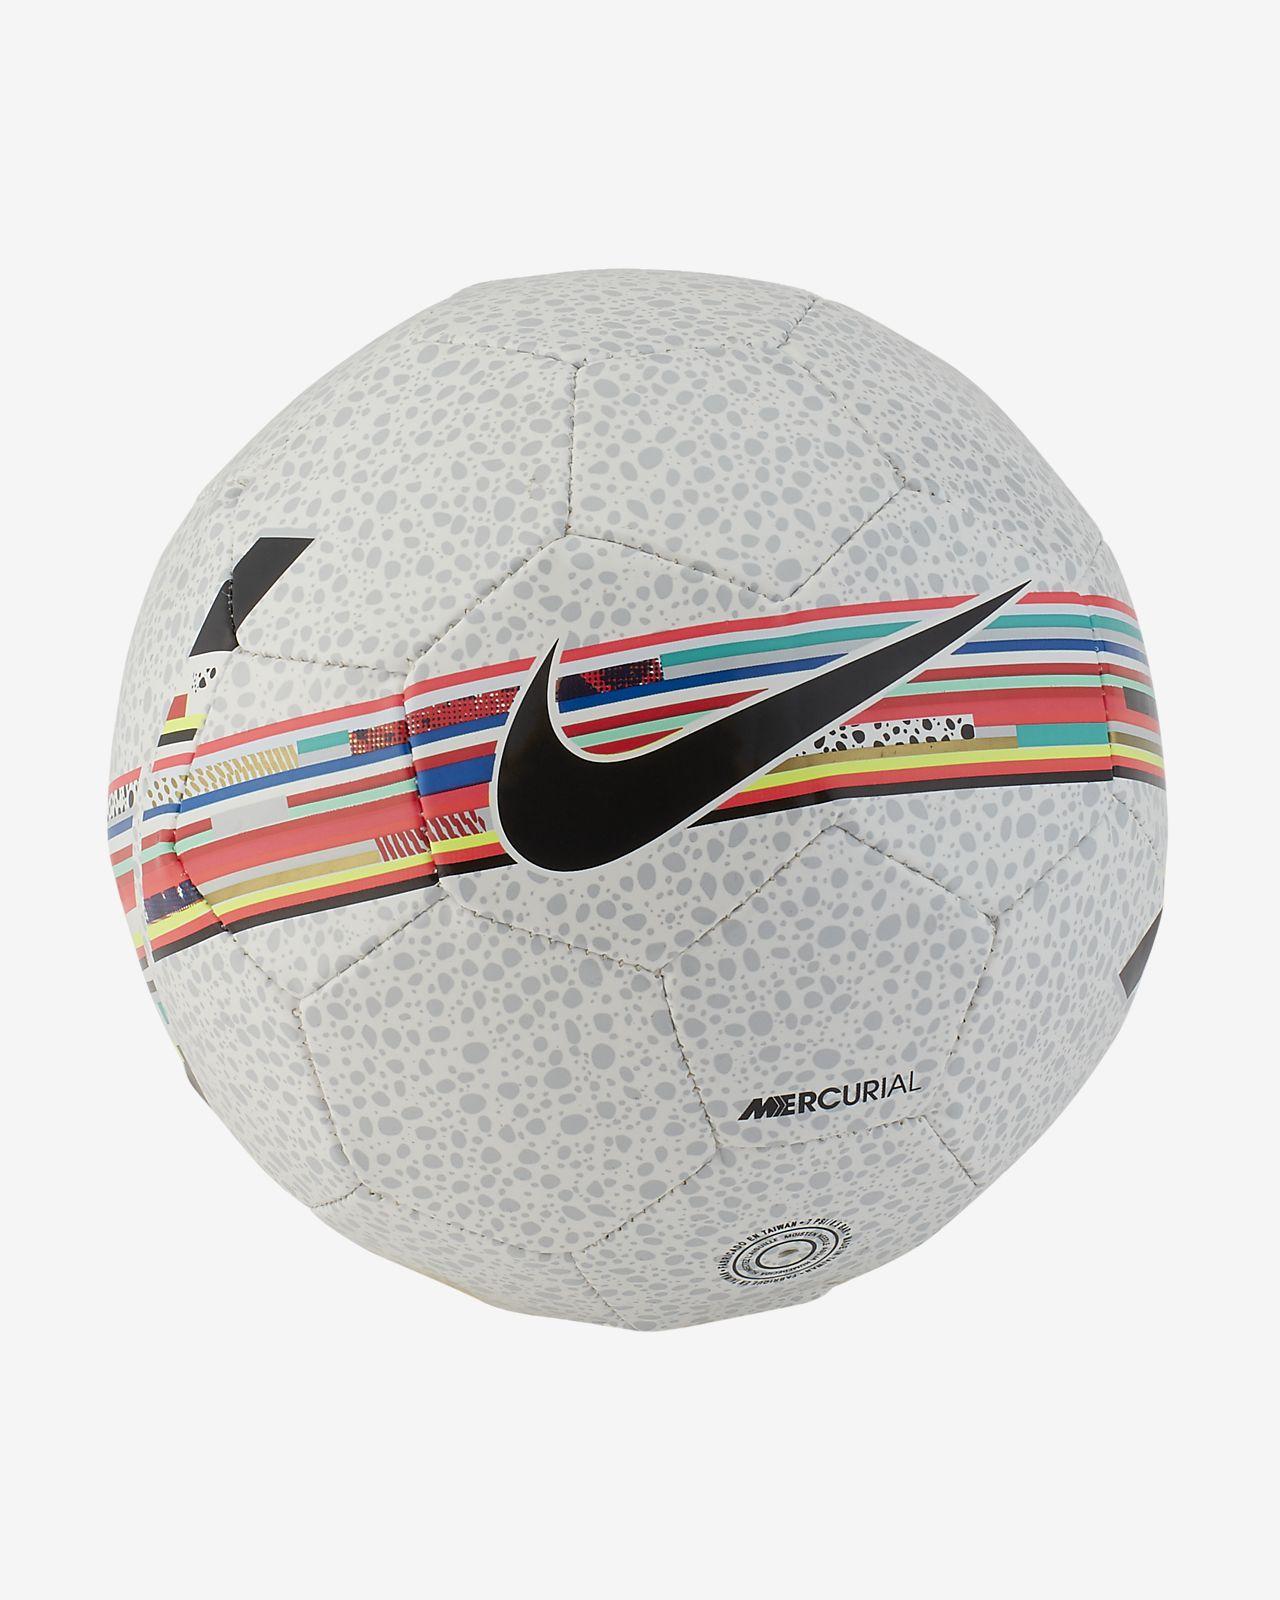 Ballon de football Nike Mercurial Skills